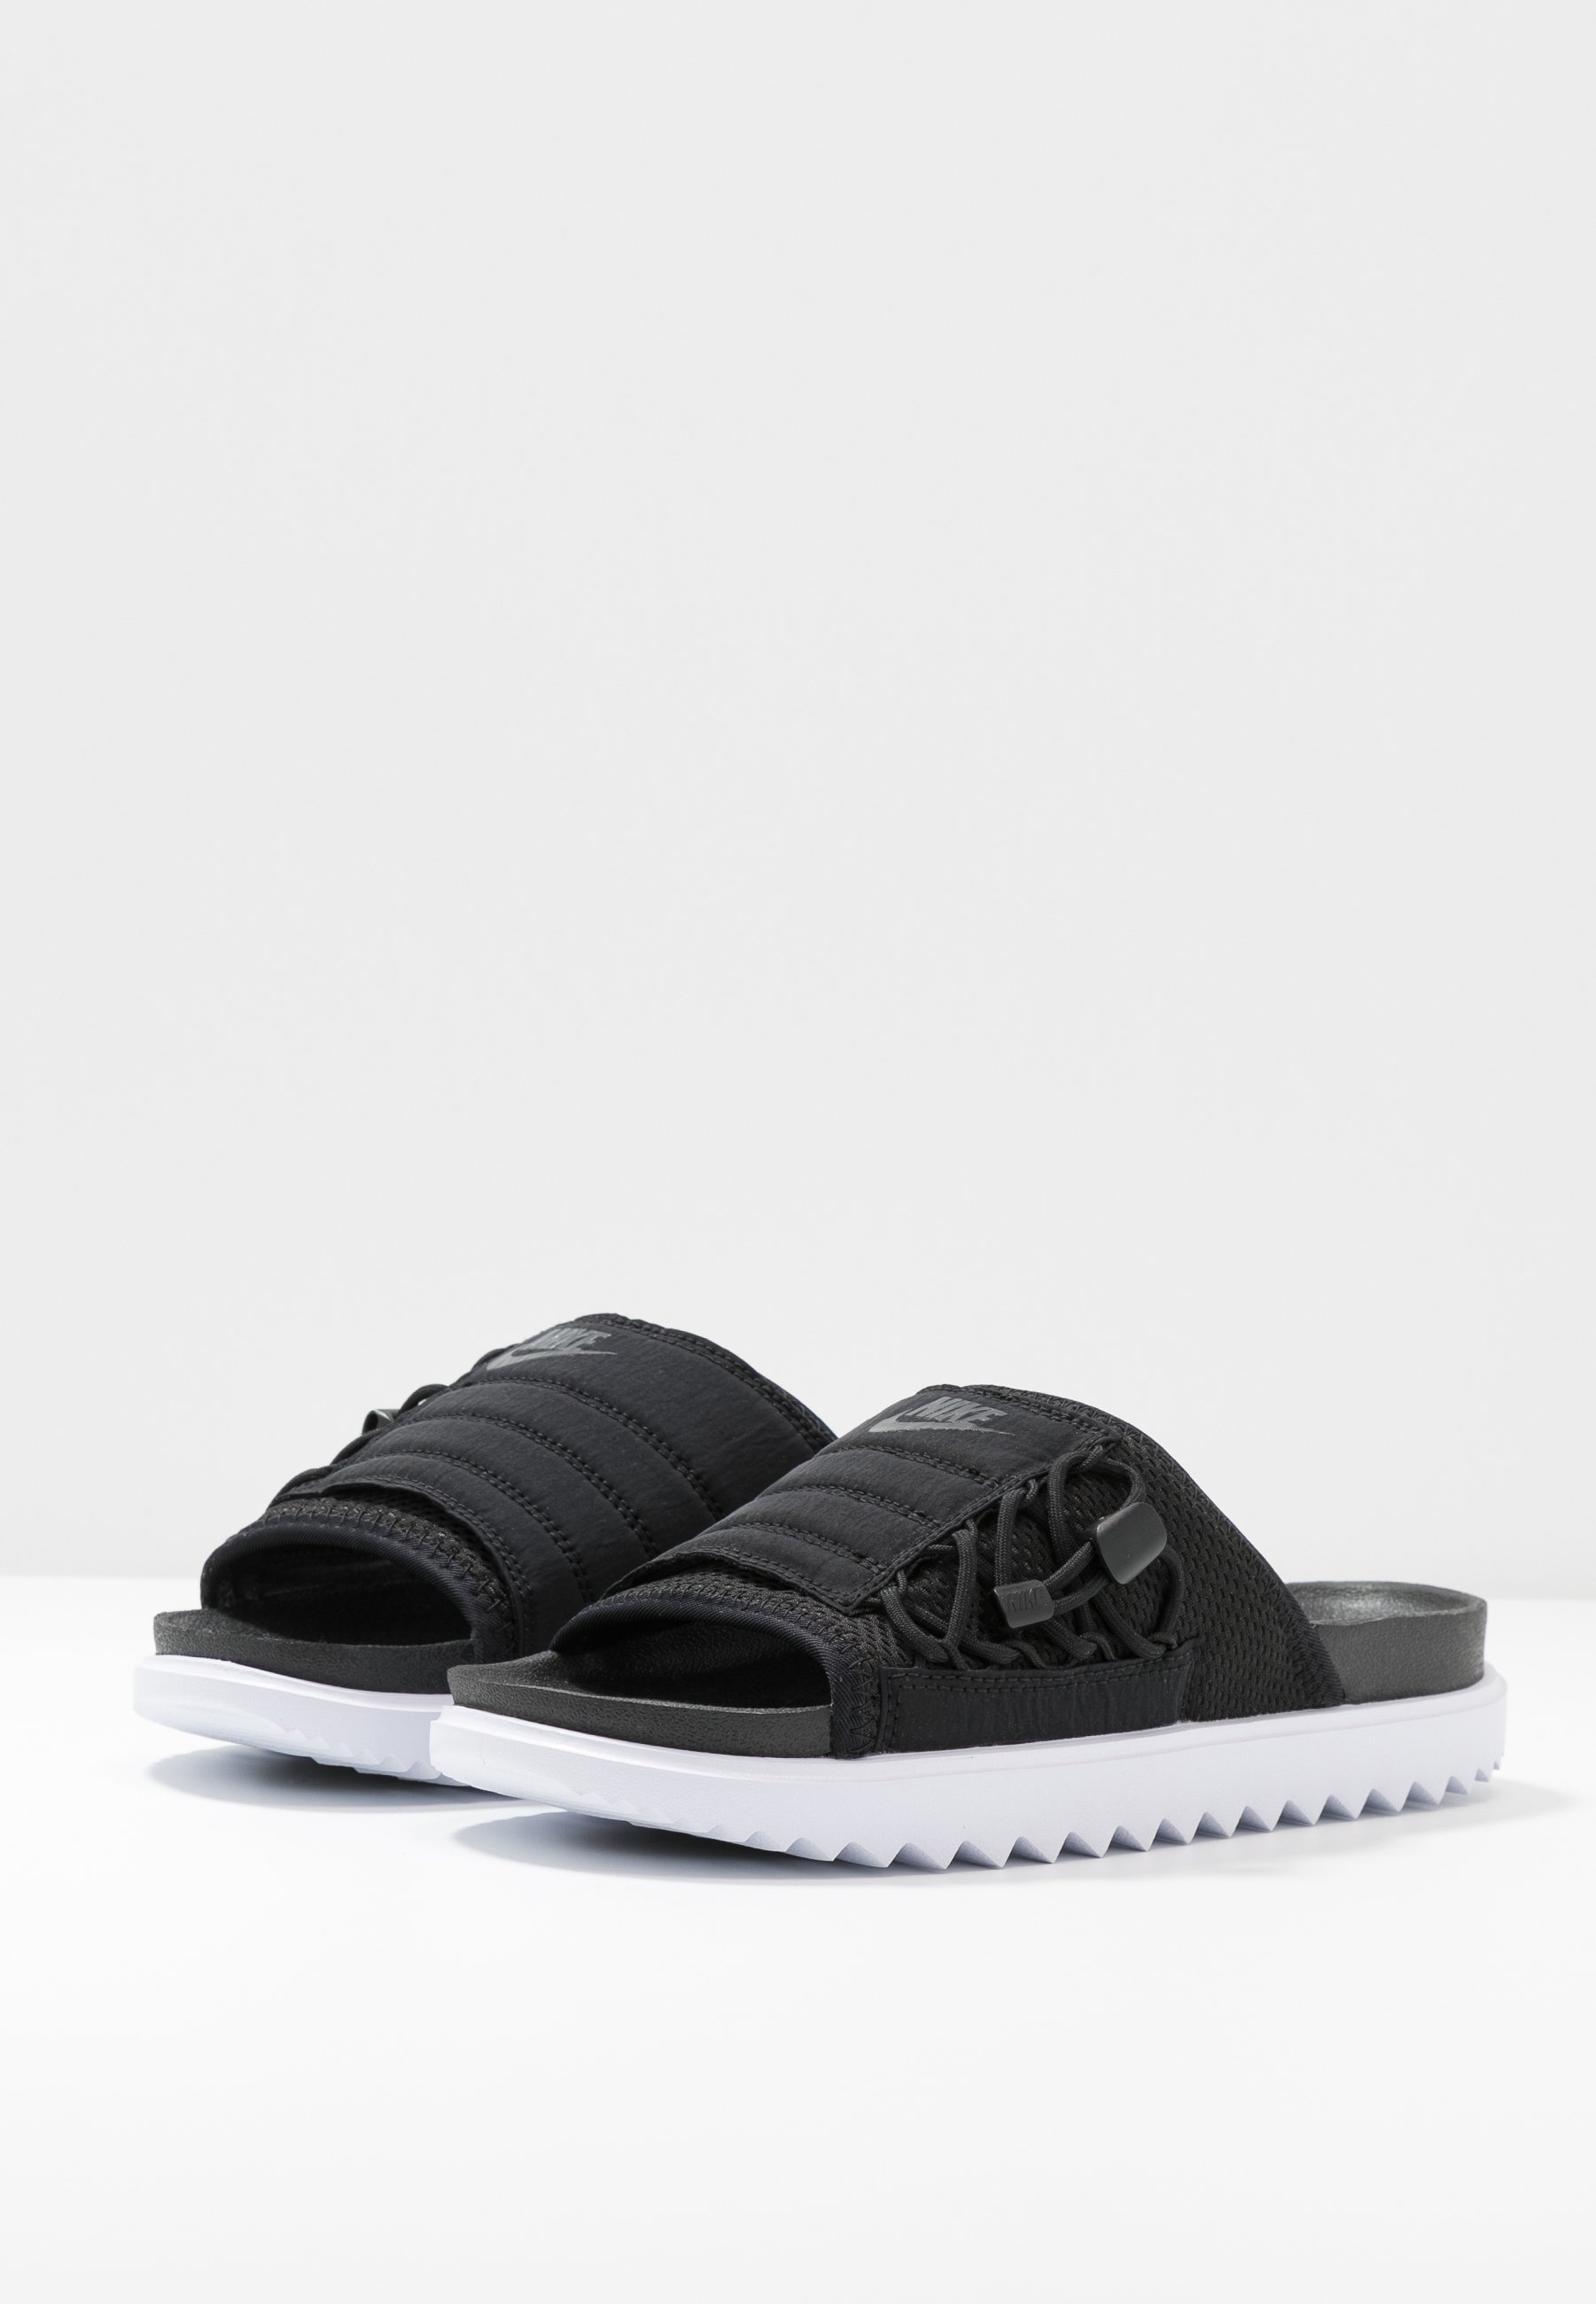 Nike Sportswear CITY SLIDE - Mules - black/anthracite/white - Mules & Sabots femme Combien